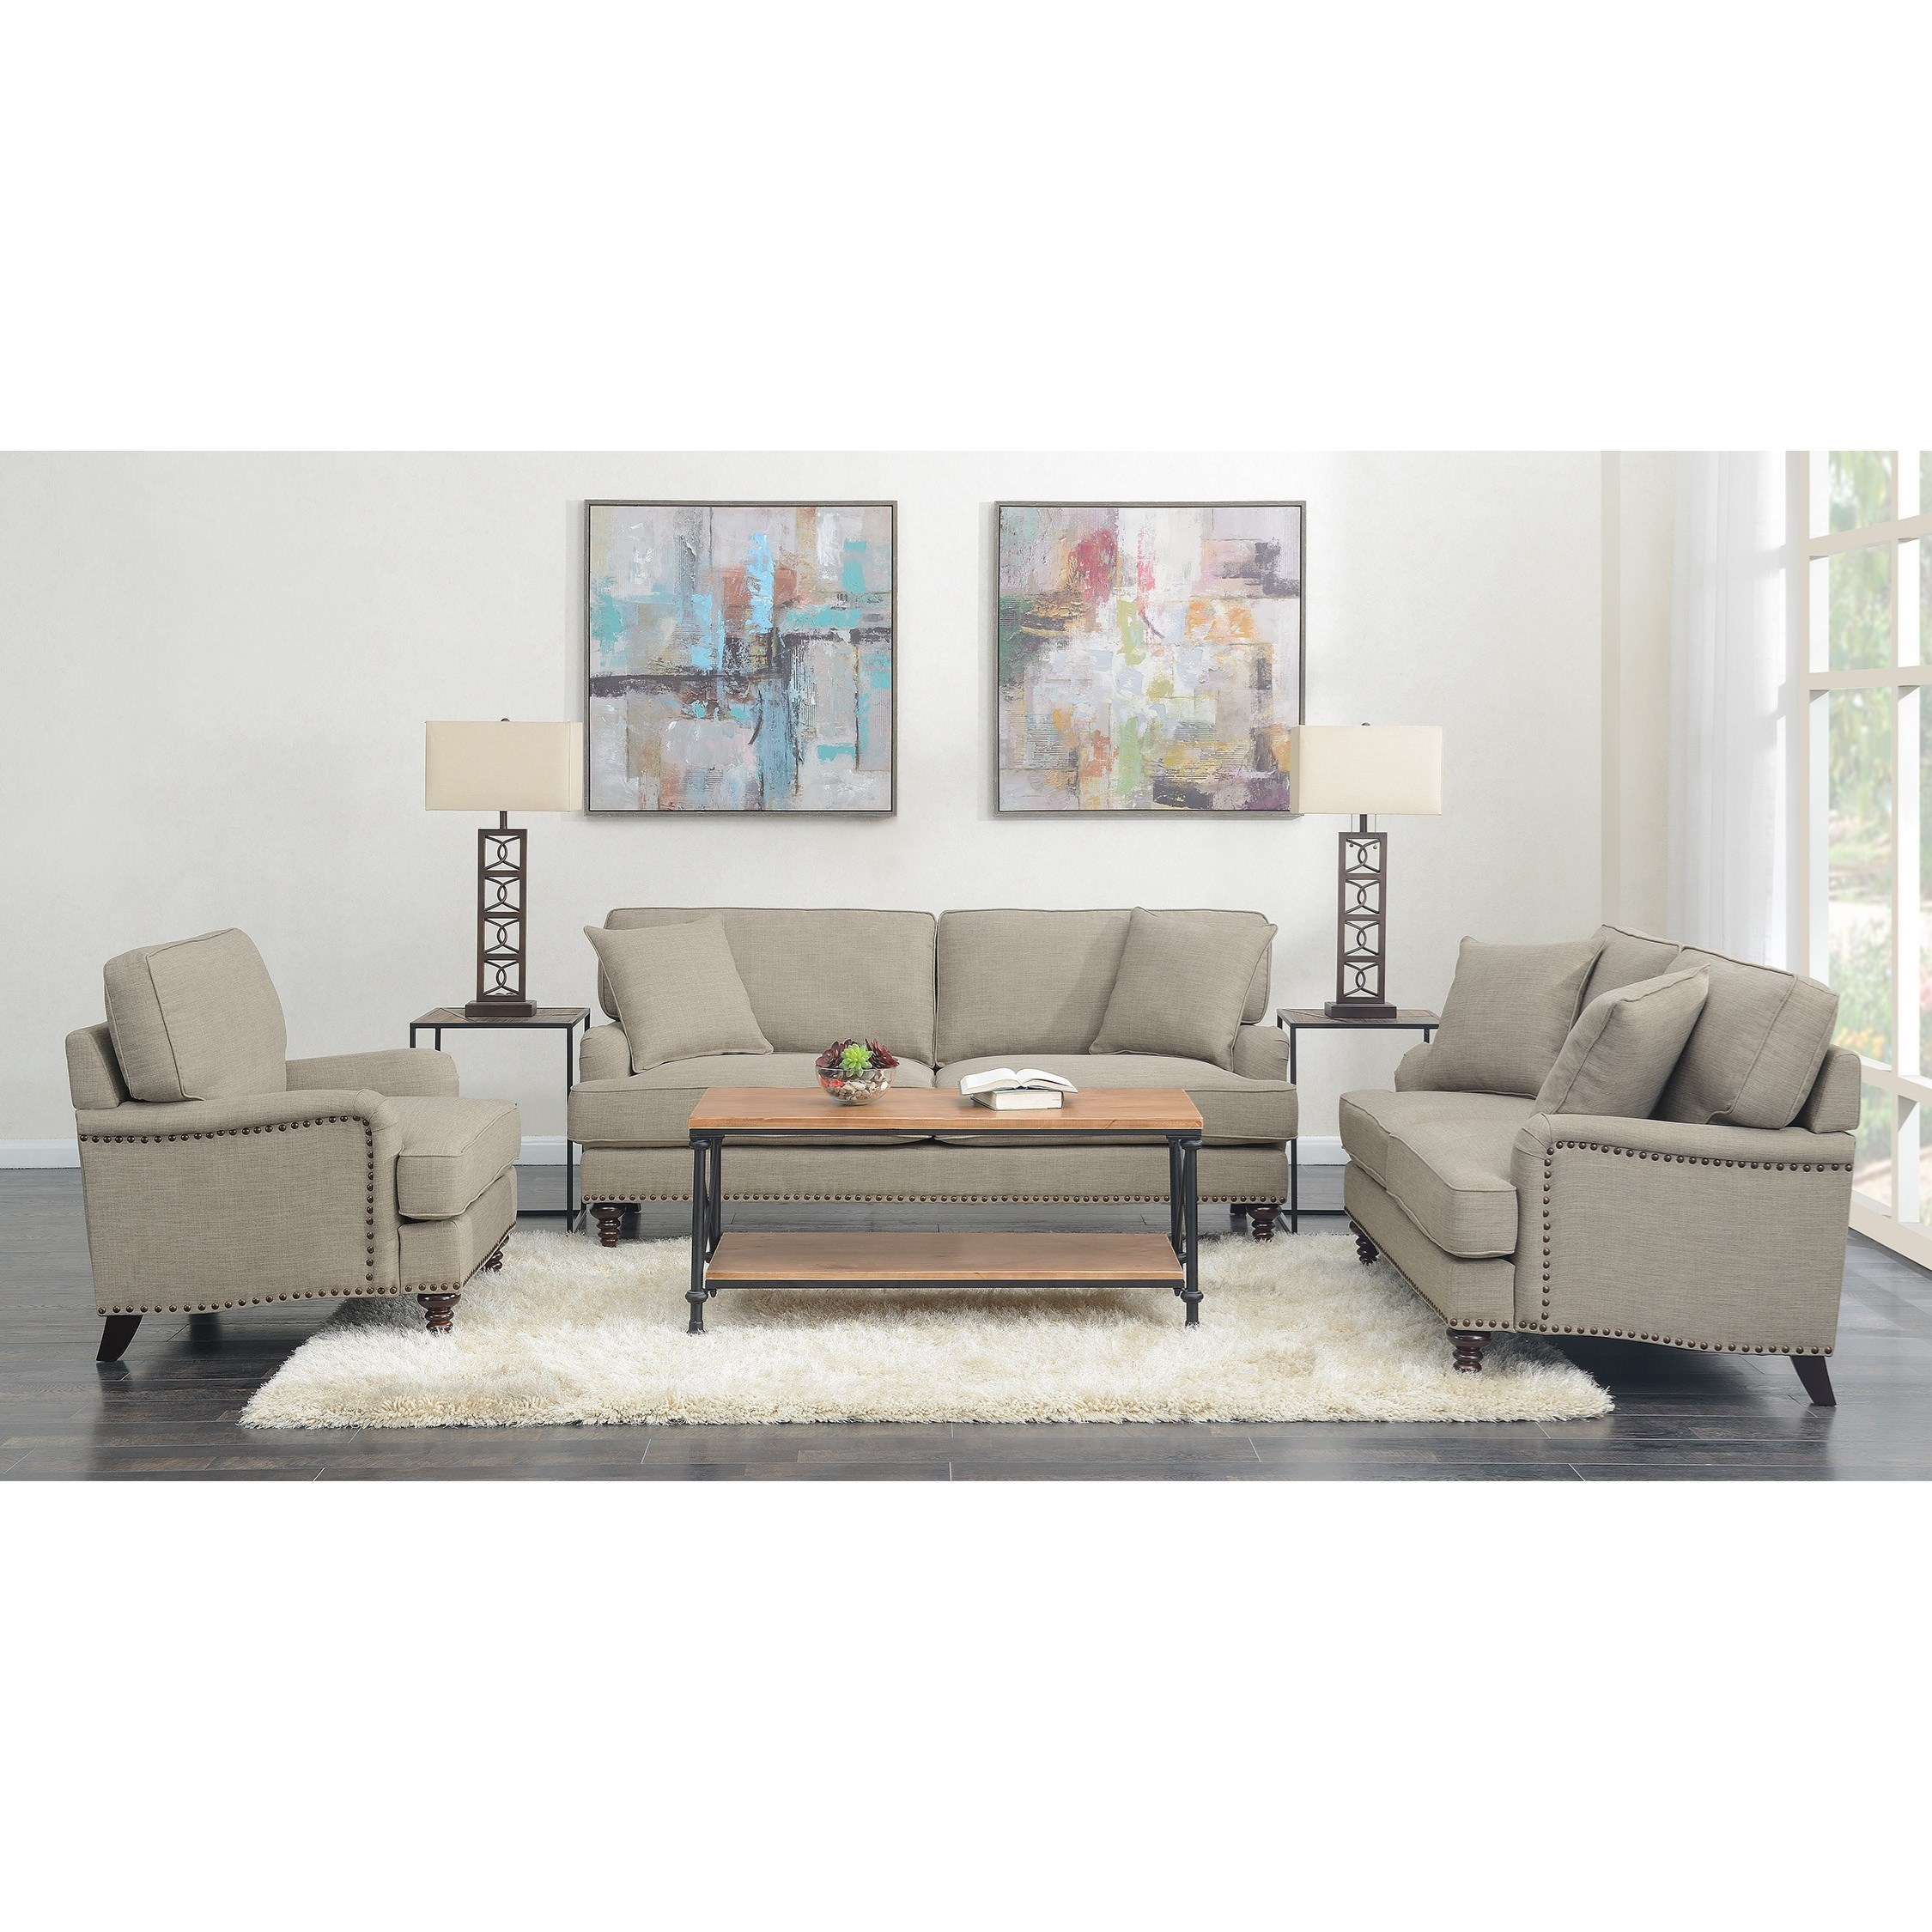 3PC Set-Sofa, Loveseat & Chair